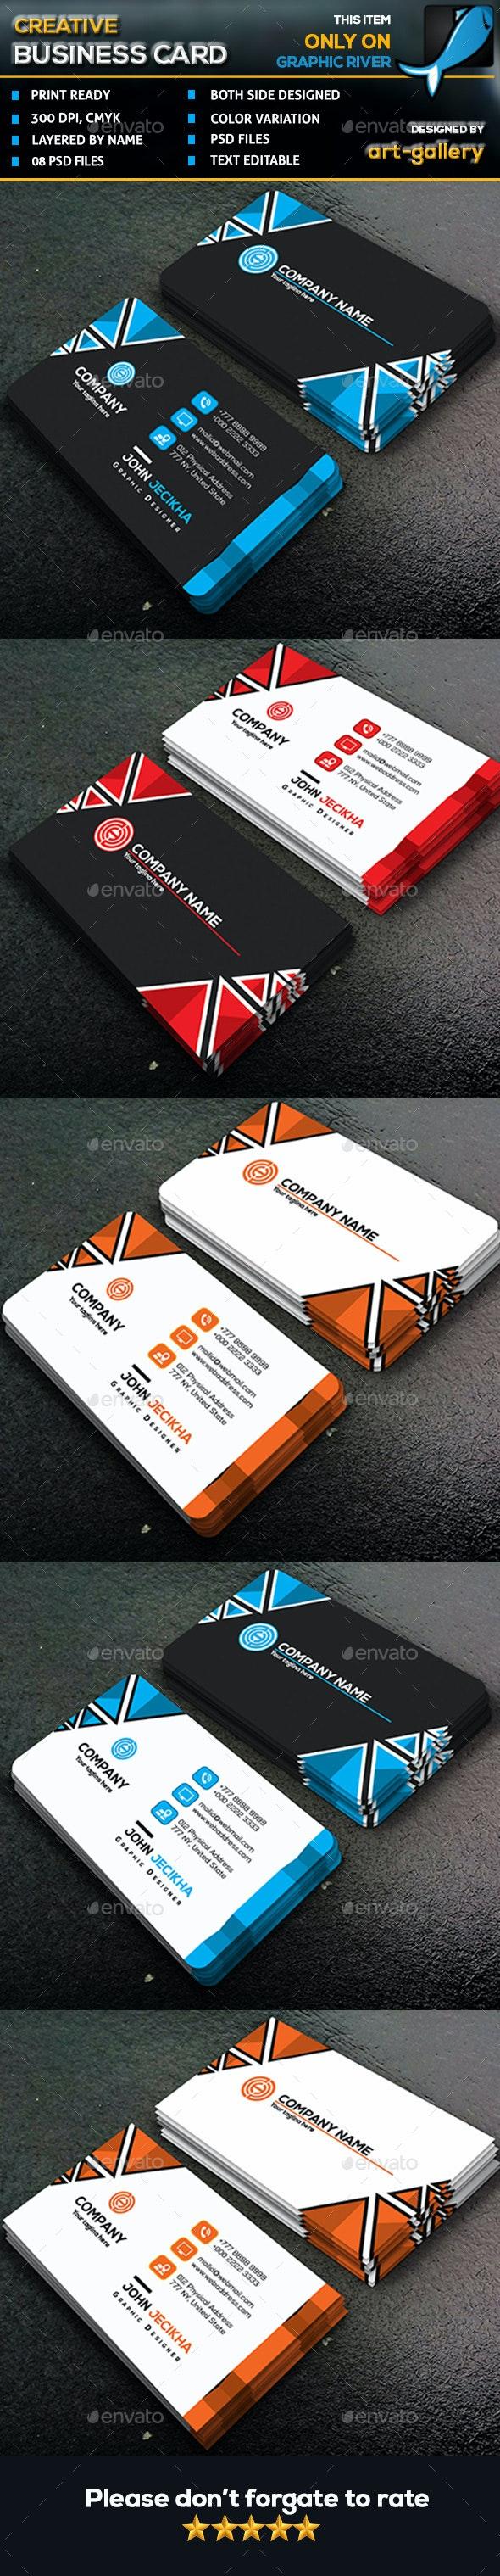 Creative  Business Card - 91B - Business Cards Print Templates